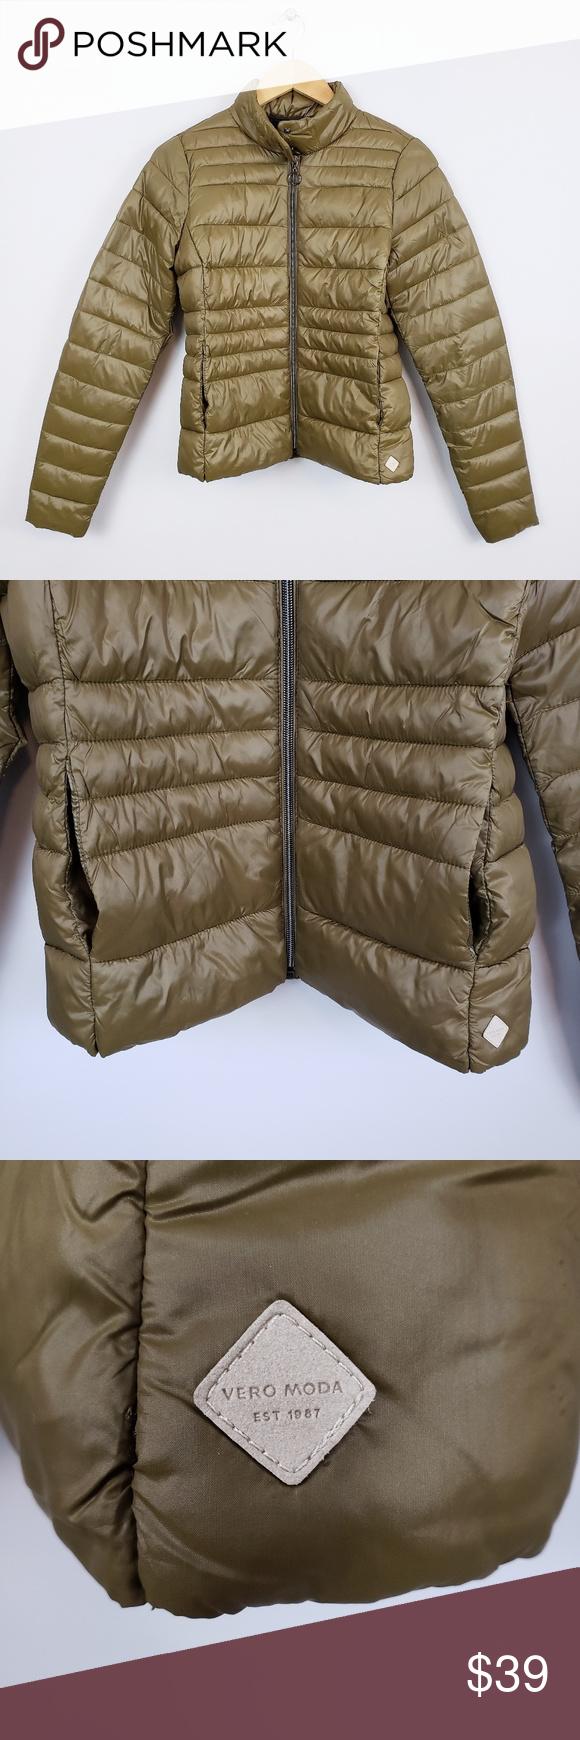 Vero Moda Military Green Puffer Jacket Green Puffer Jacket Vero Moda Thin Jacket [ 1740 x 580 Pixel ]